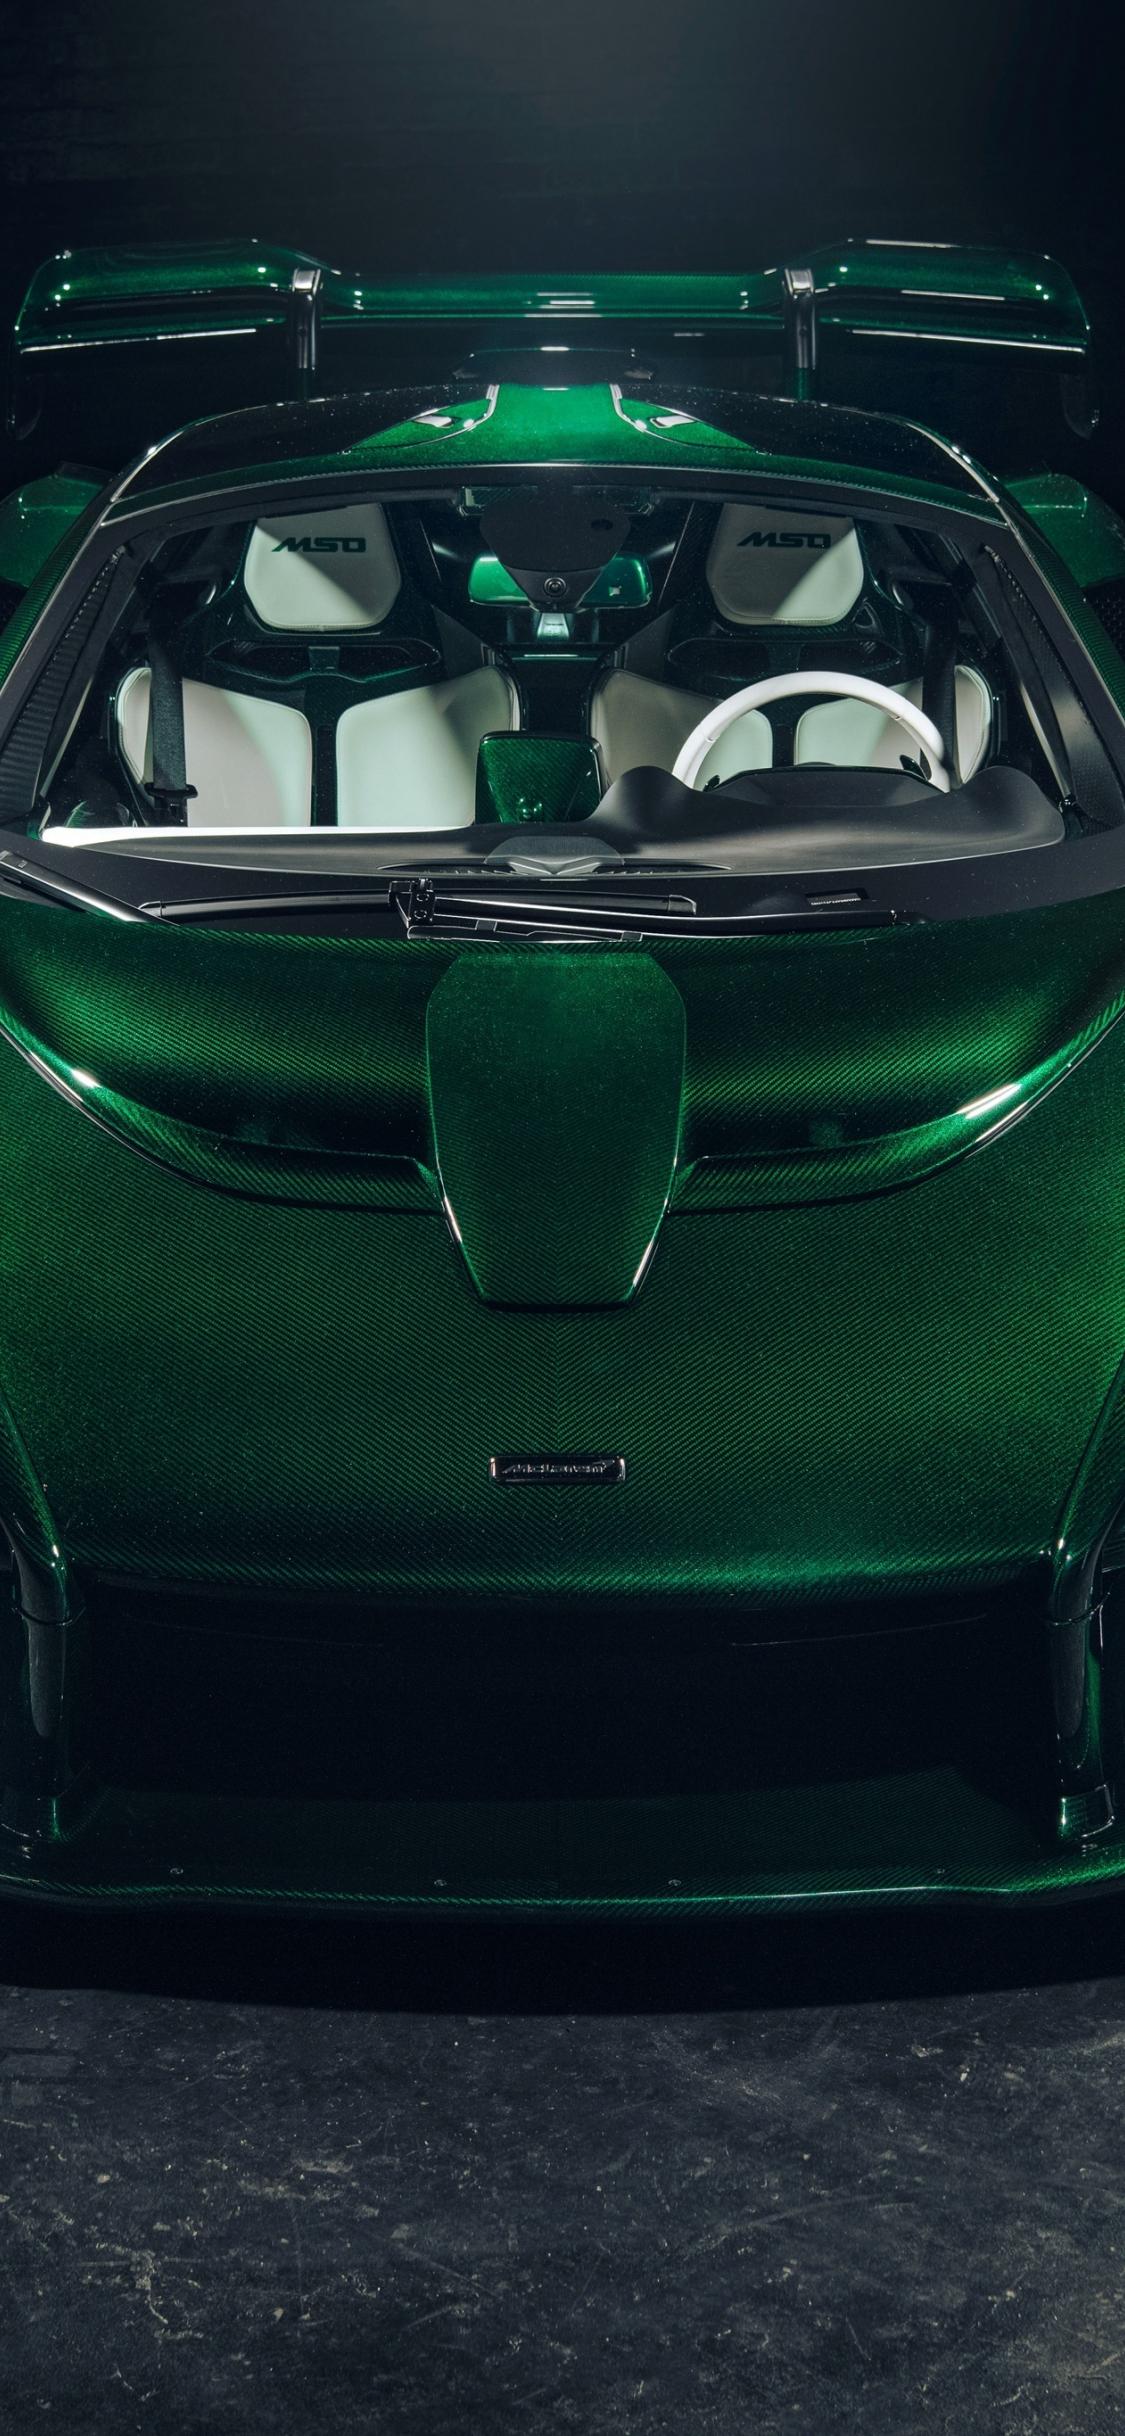 Download 1125x2436 Wallpaper Green Sports Car Front Mso Mclaren Senna Iphone X 1125x2436 Hd Image Background 10501